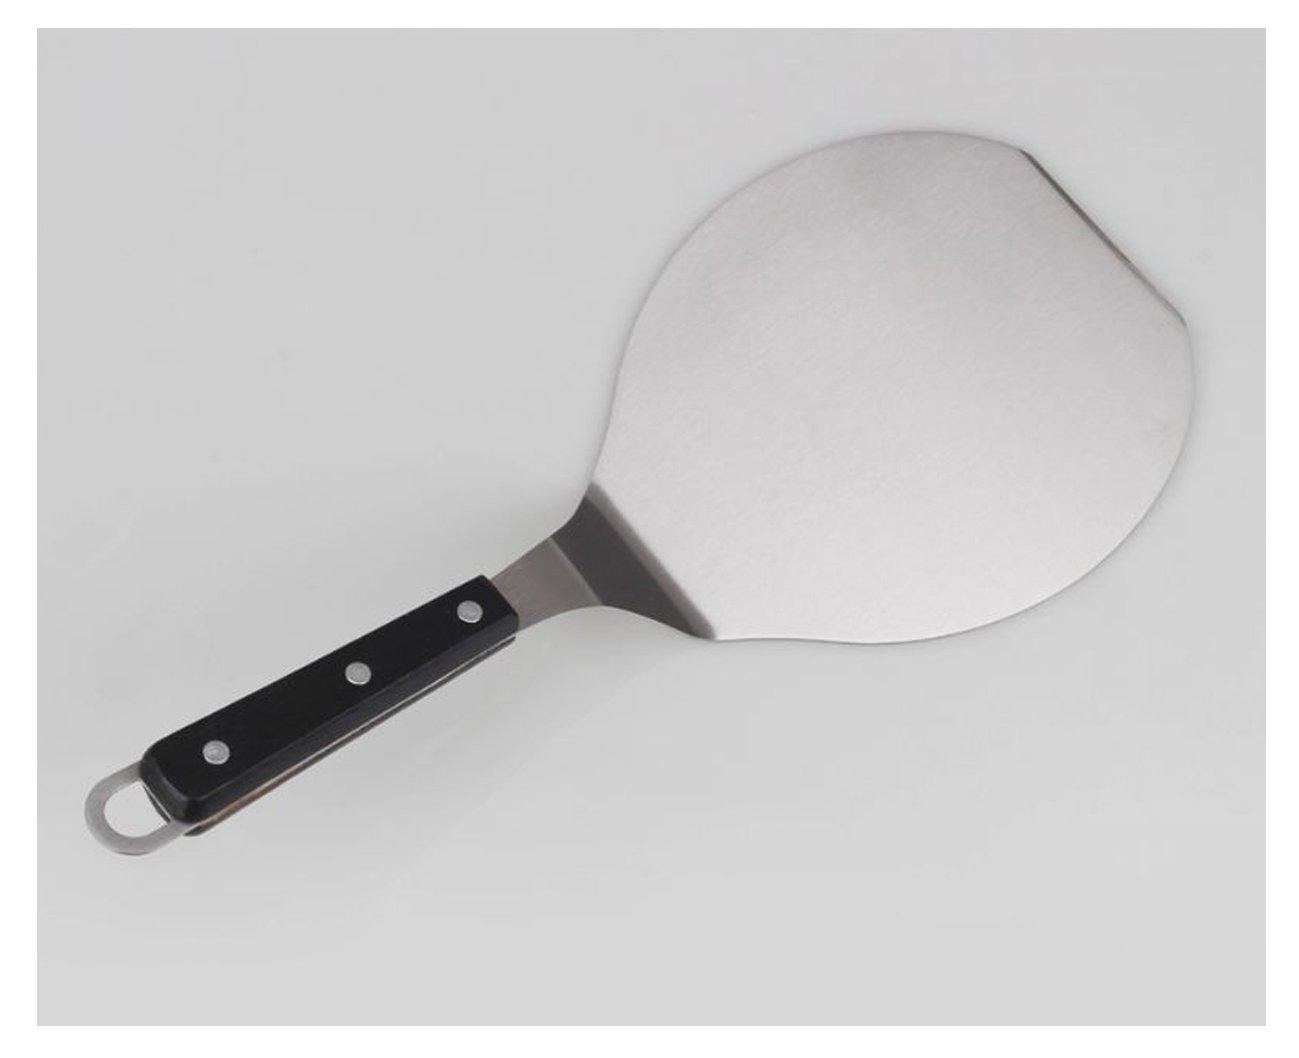 Ecentaur Pizza Spatula Cake Lifter Pizza Peel Transfer Pie Shovel Pastry Move Plate Baking Accessories